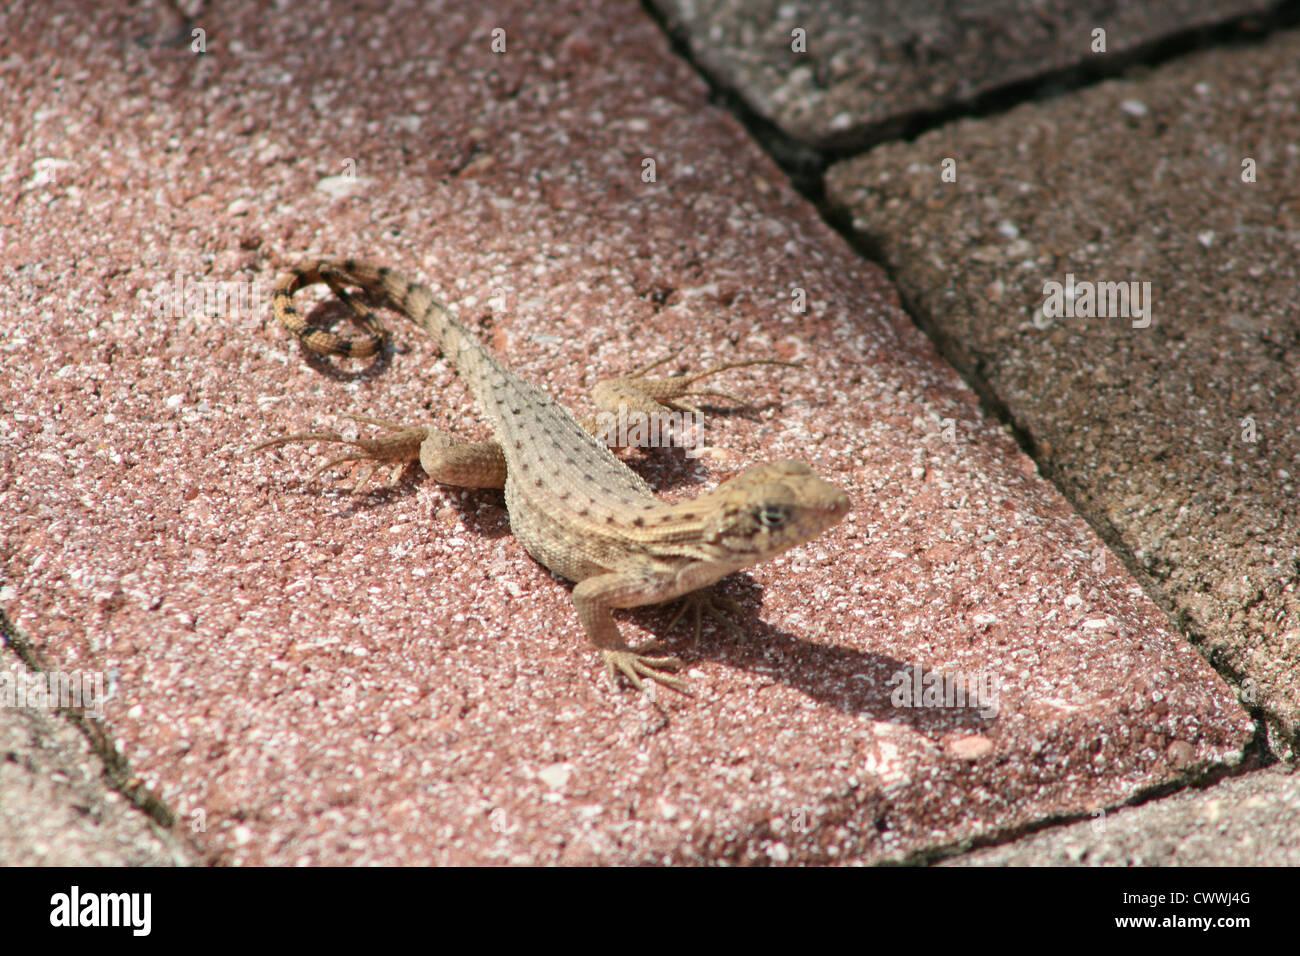 lizard brown cute animal closeup picture - Stock Image